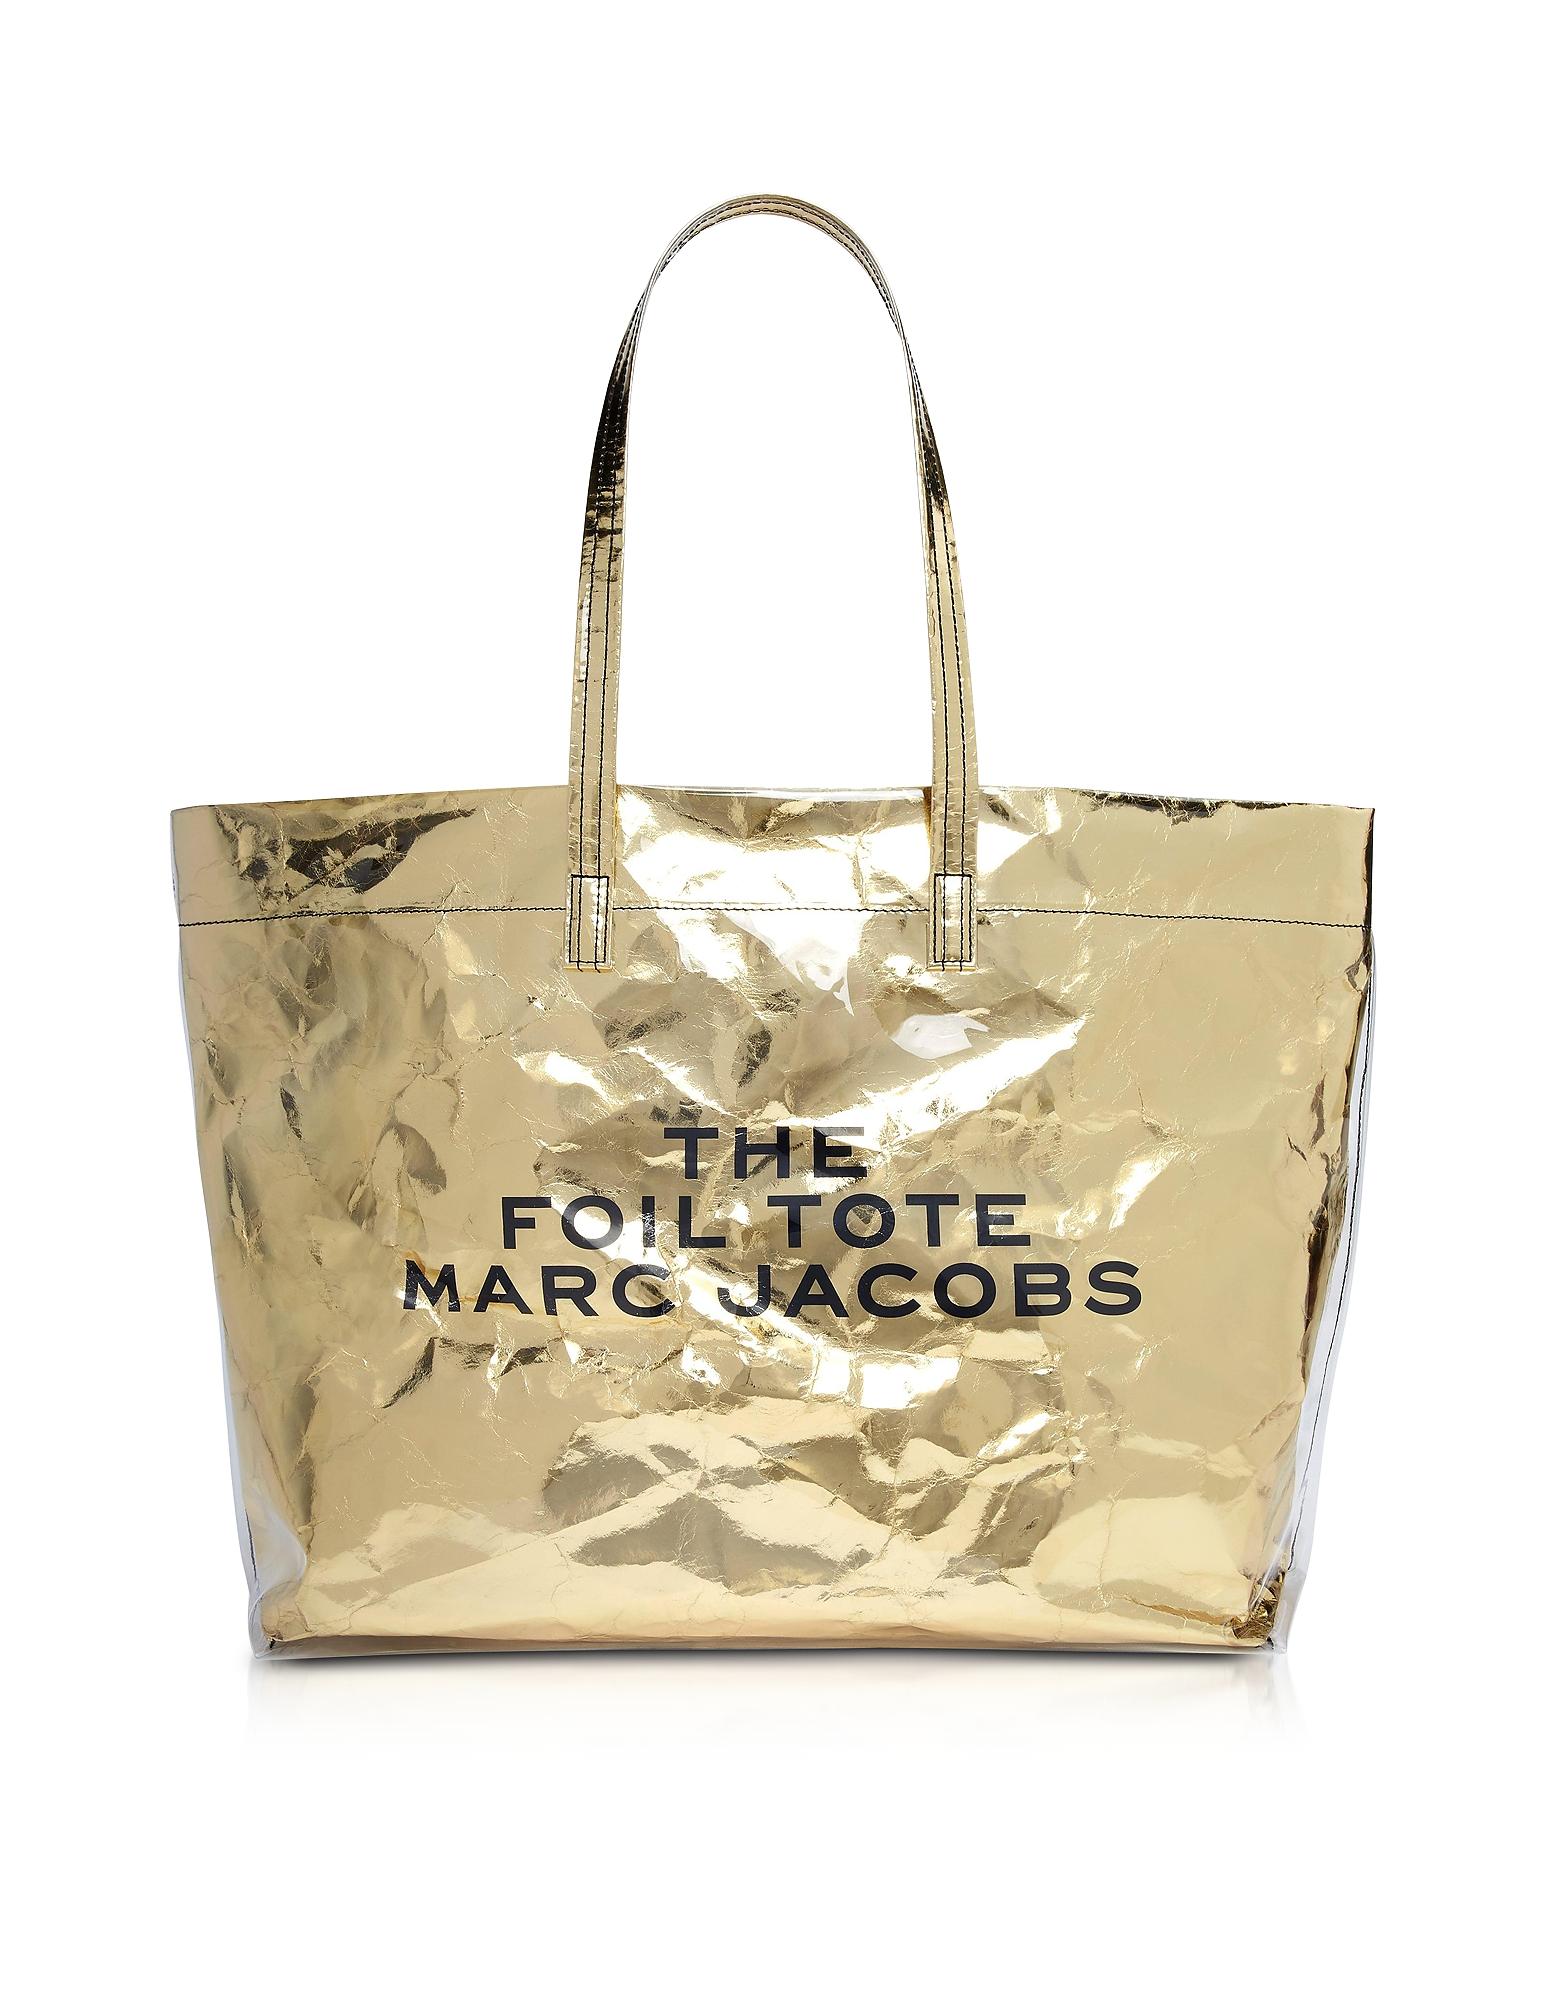 The Foil Tote Bag